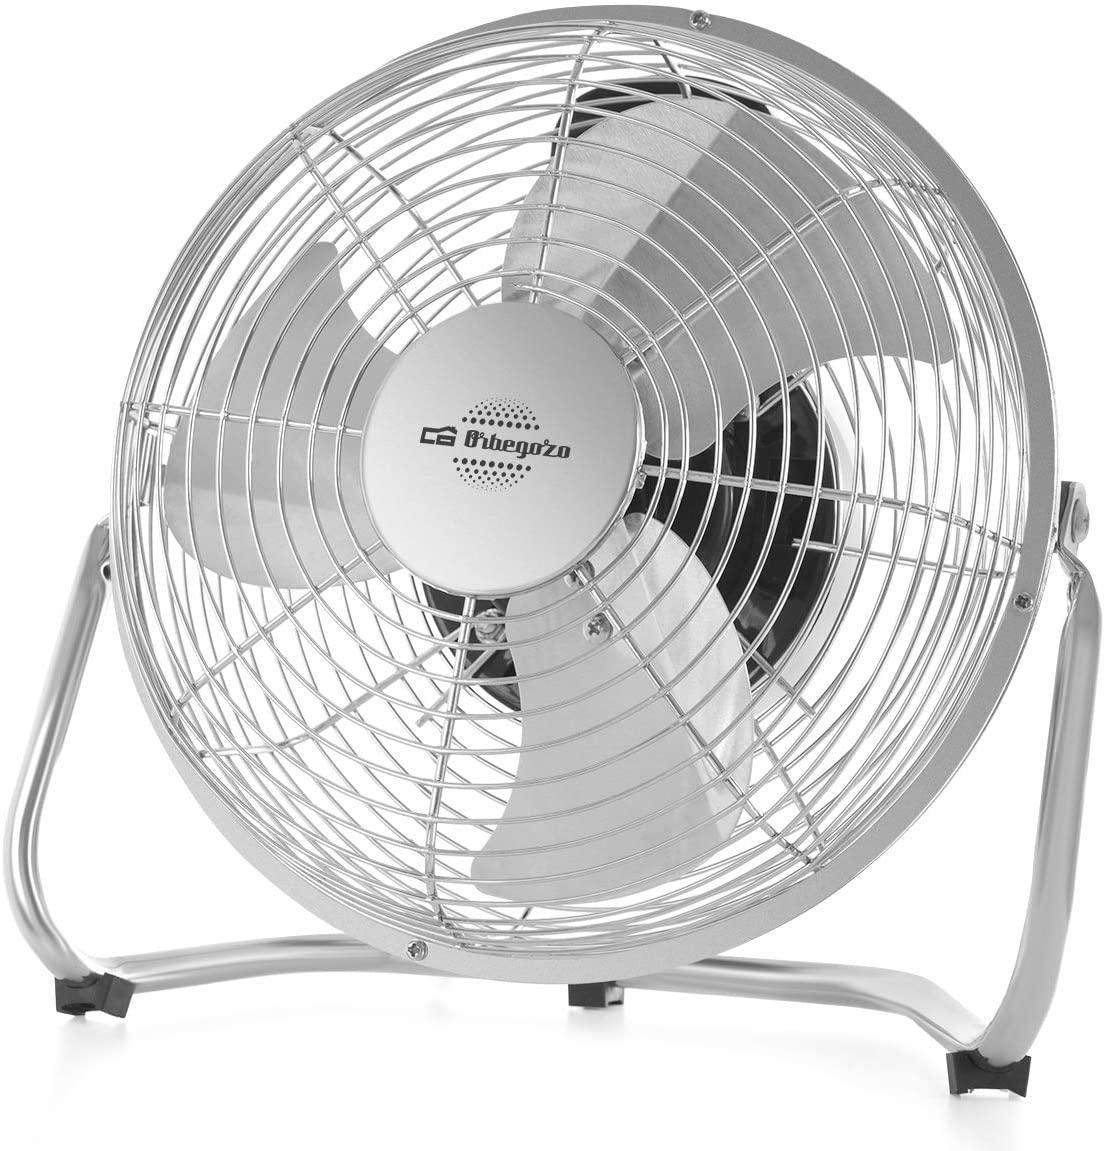 Ventilador industrial Power Fan Orbegozo PW 1321